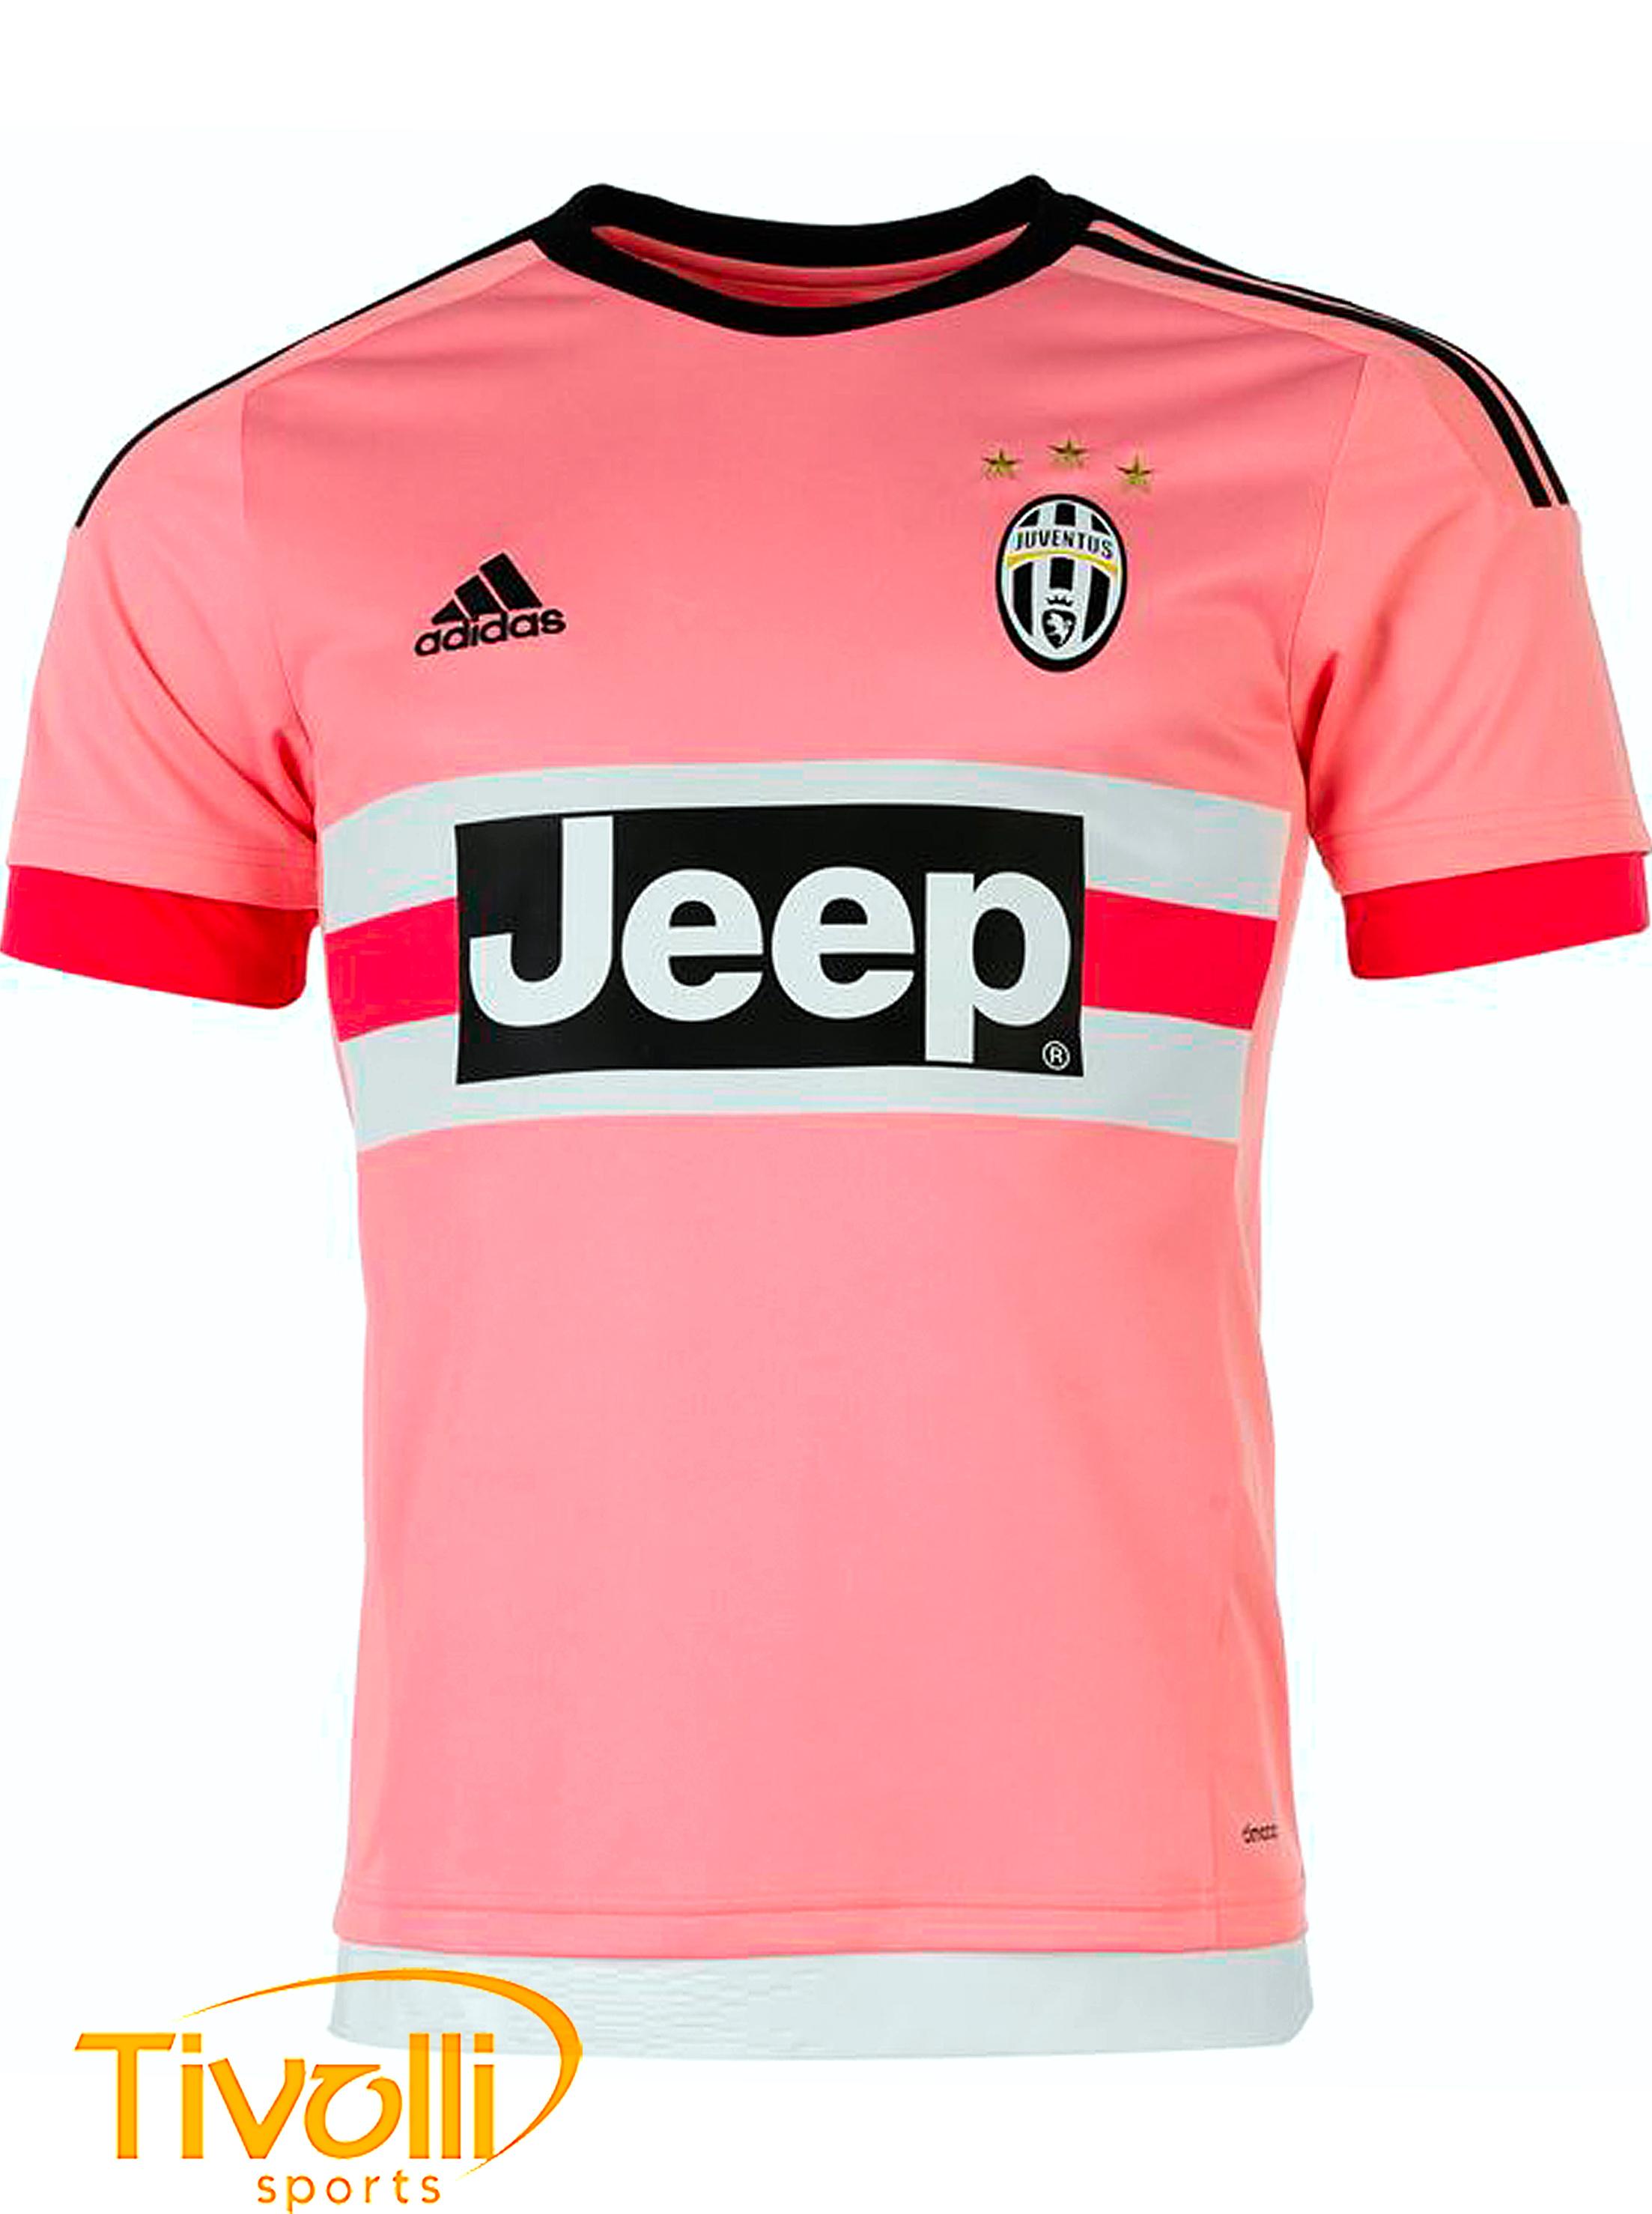 a4bf955047 Camisa Juventus II Adidas Infantil > - Mega Saldão >